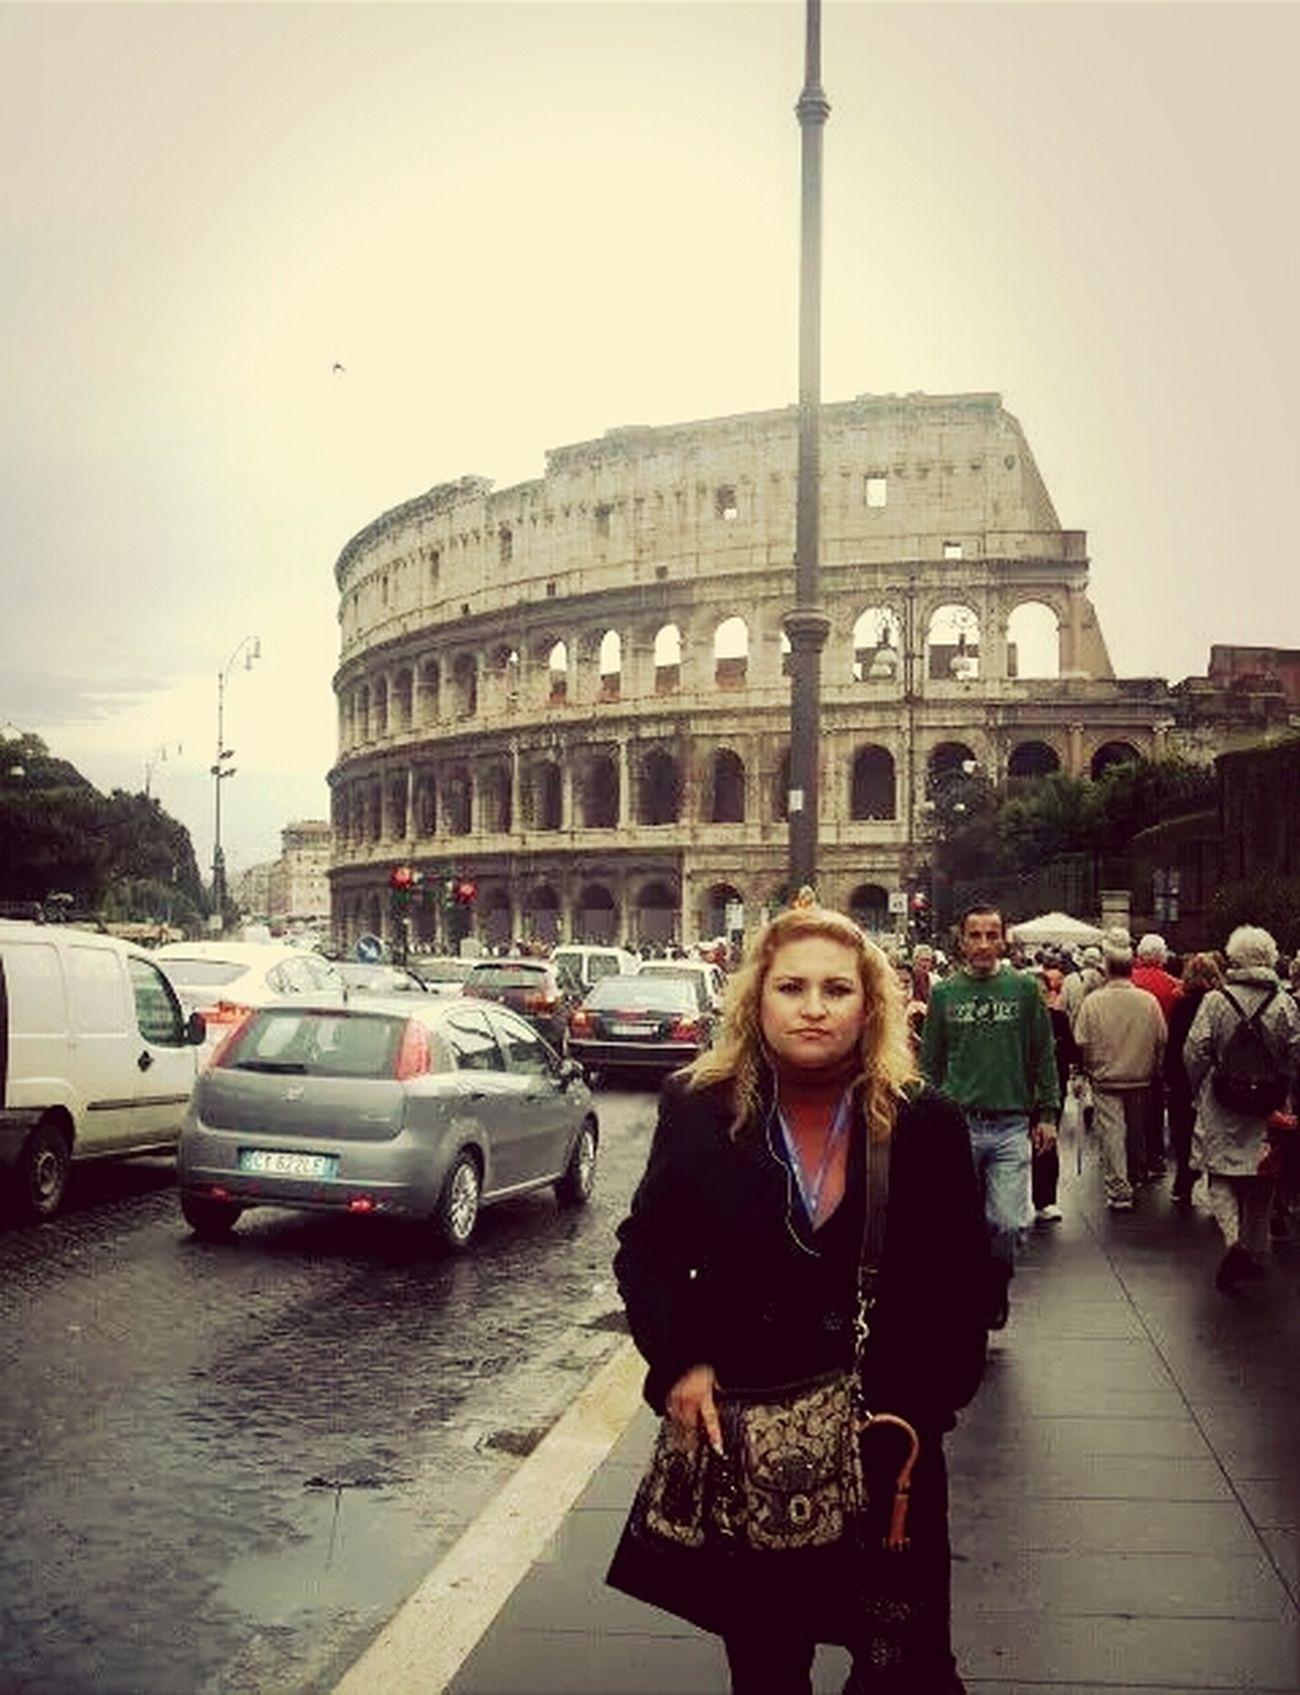 Coliseo Romano That's Me Hello World Happy Vacation